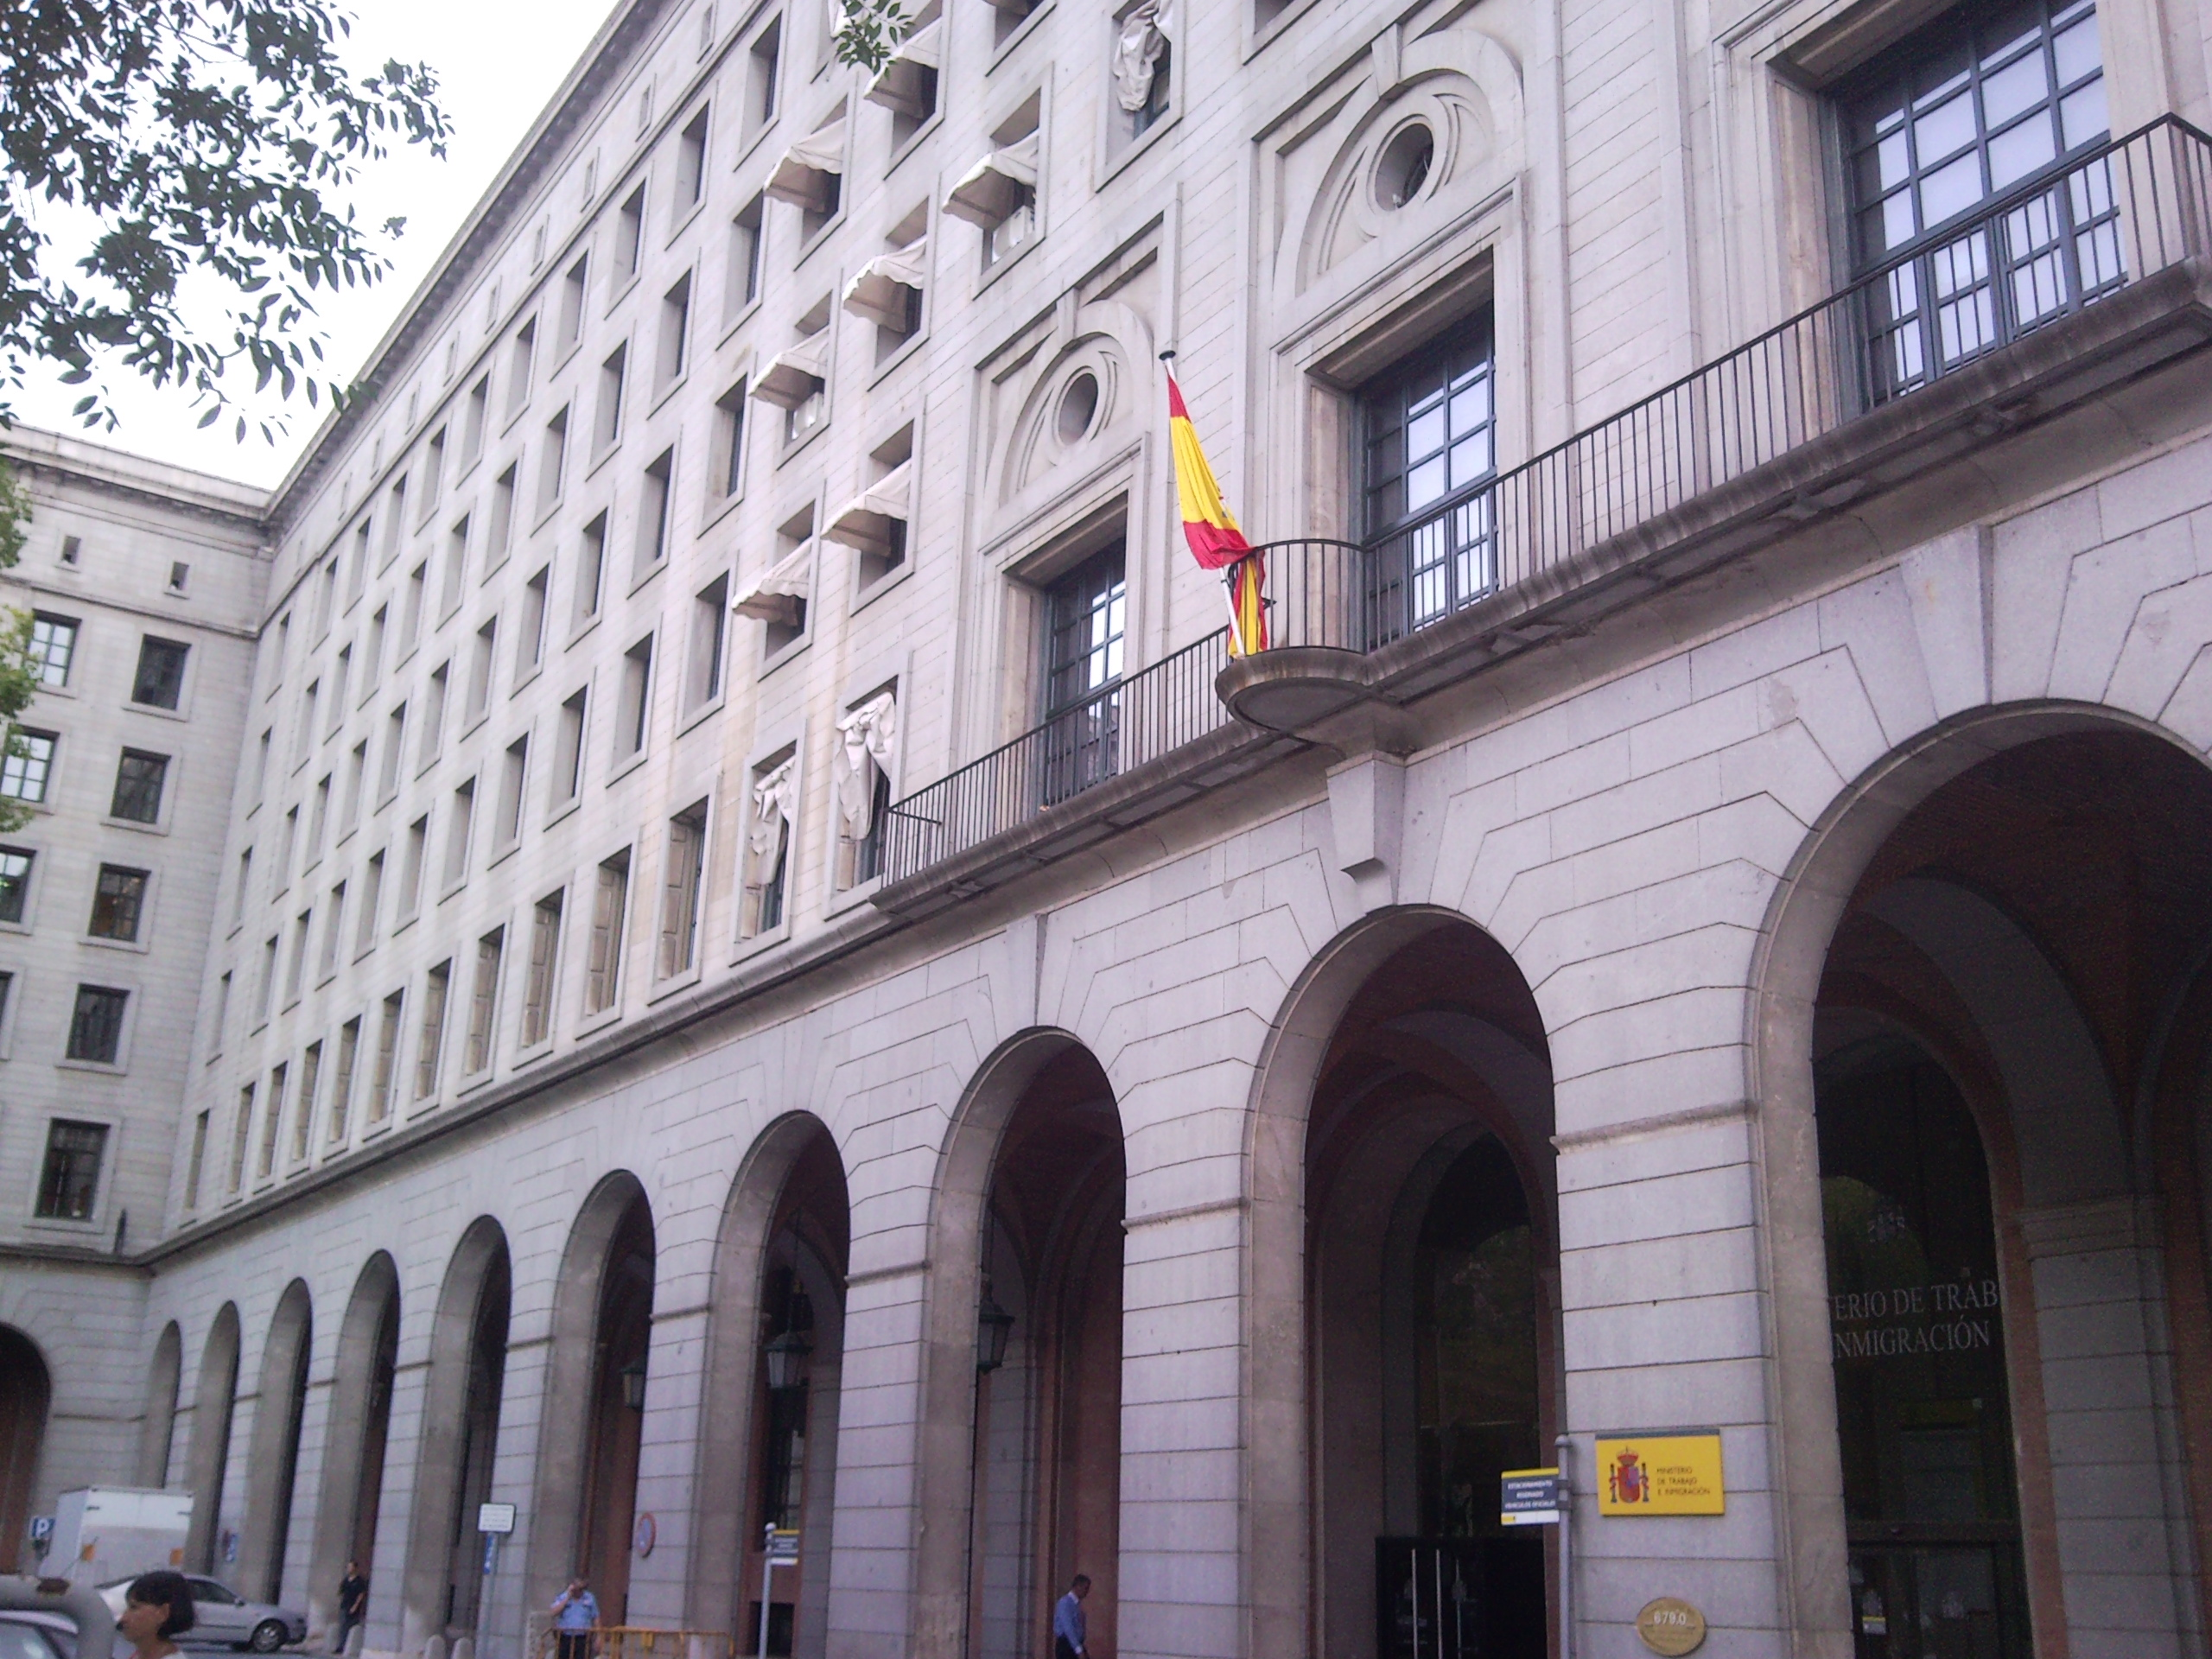 Ministerio De Trabajo E Inmigracion (Spain)